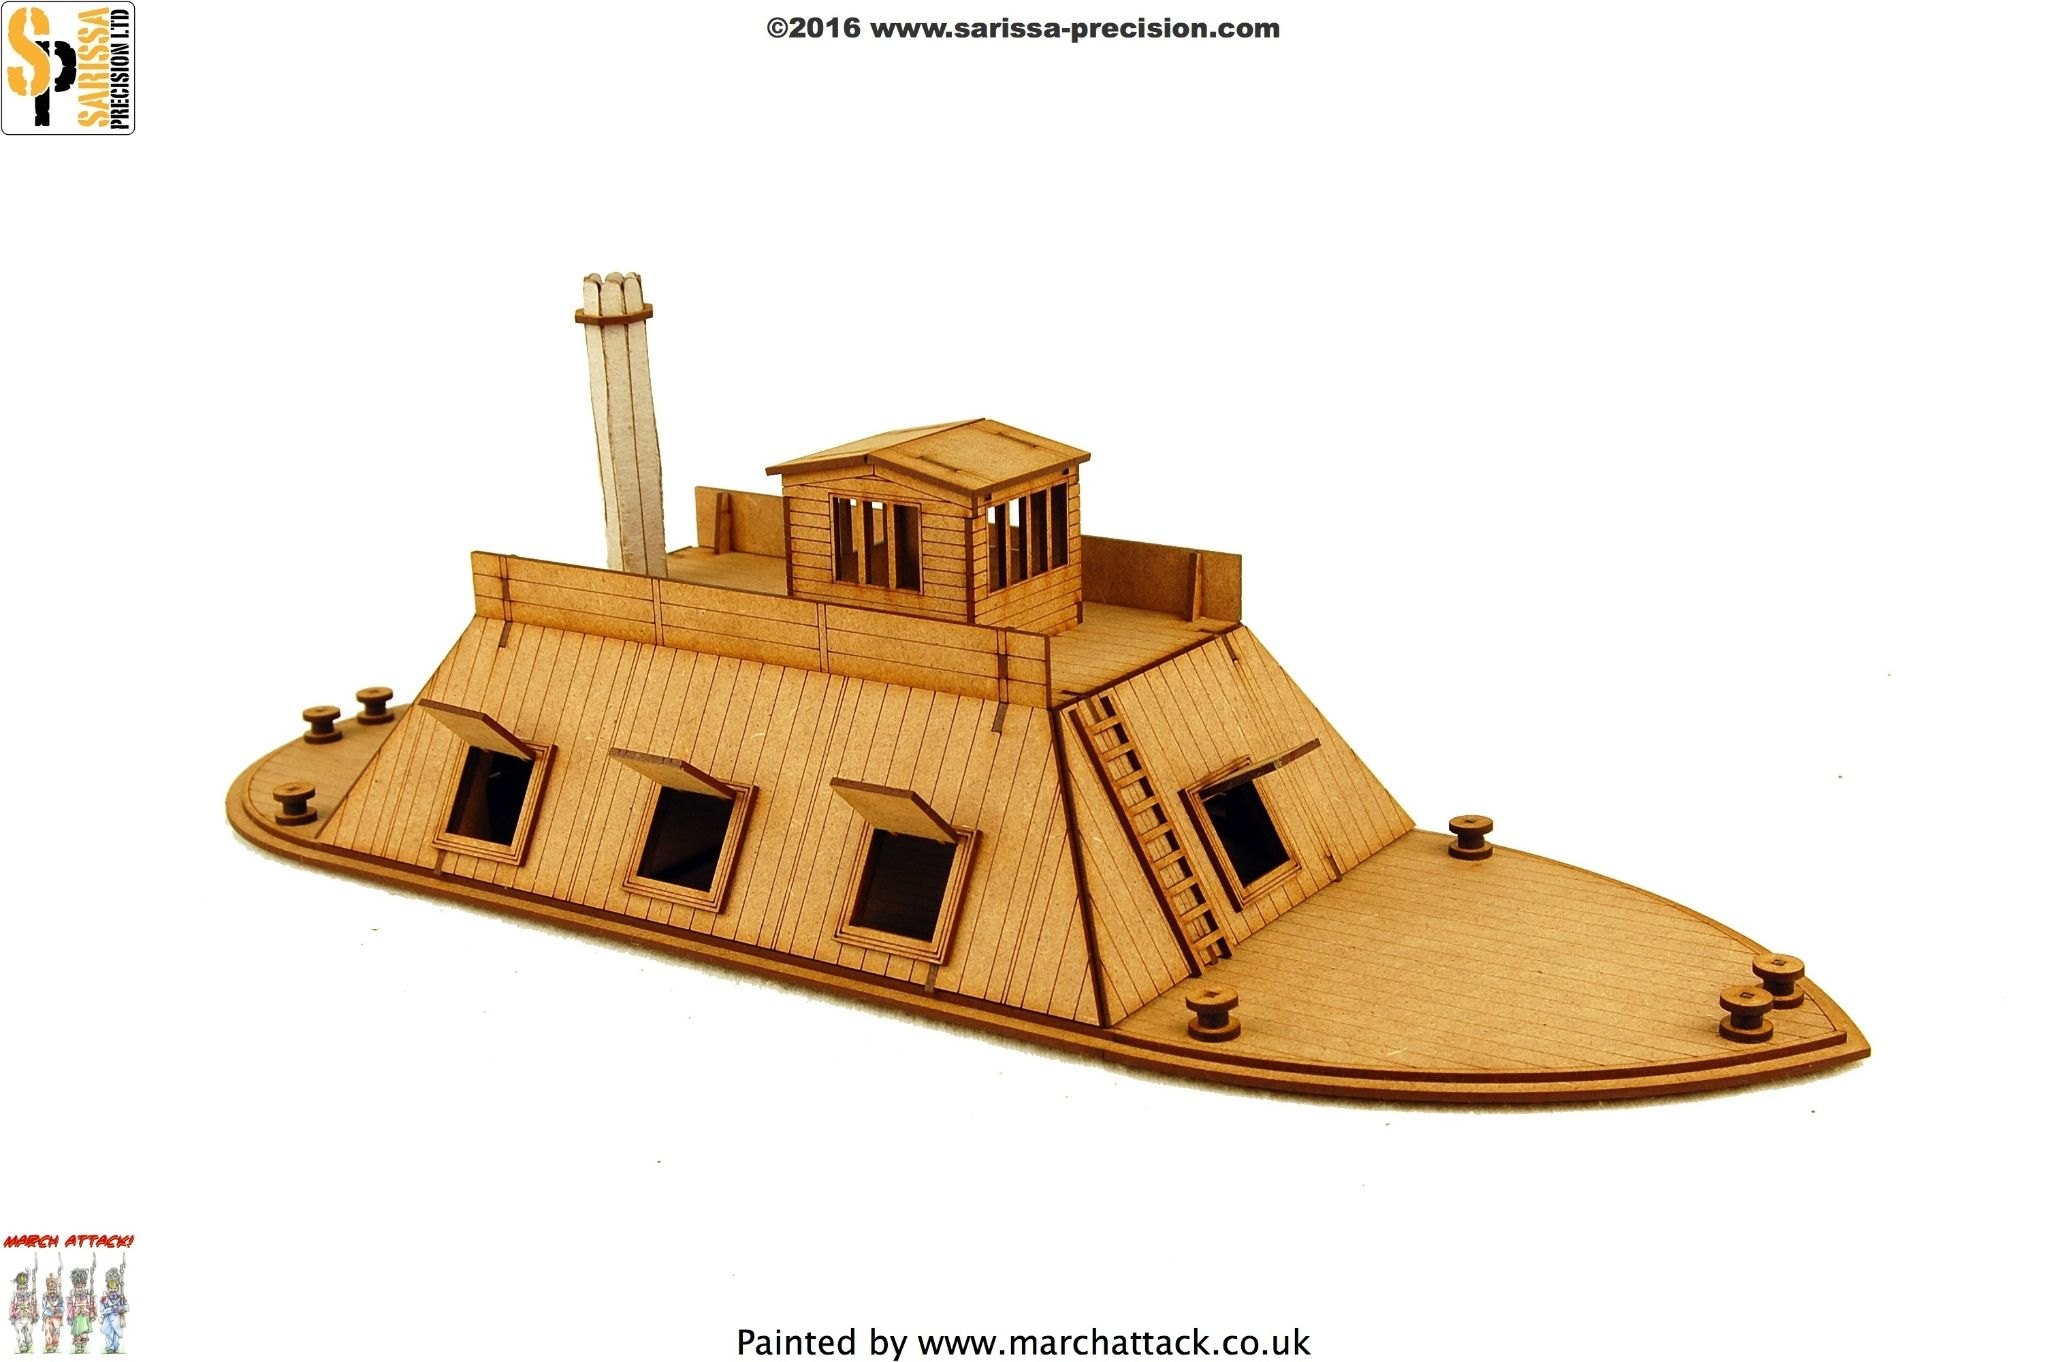 http://www.sarissa-precision.com/Ironclad_Gunboat/p1603368_12655442.aspx